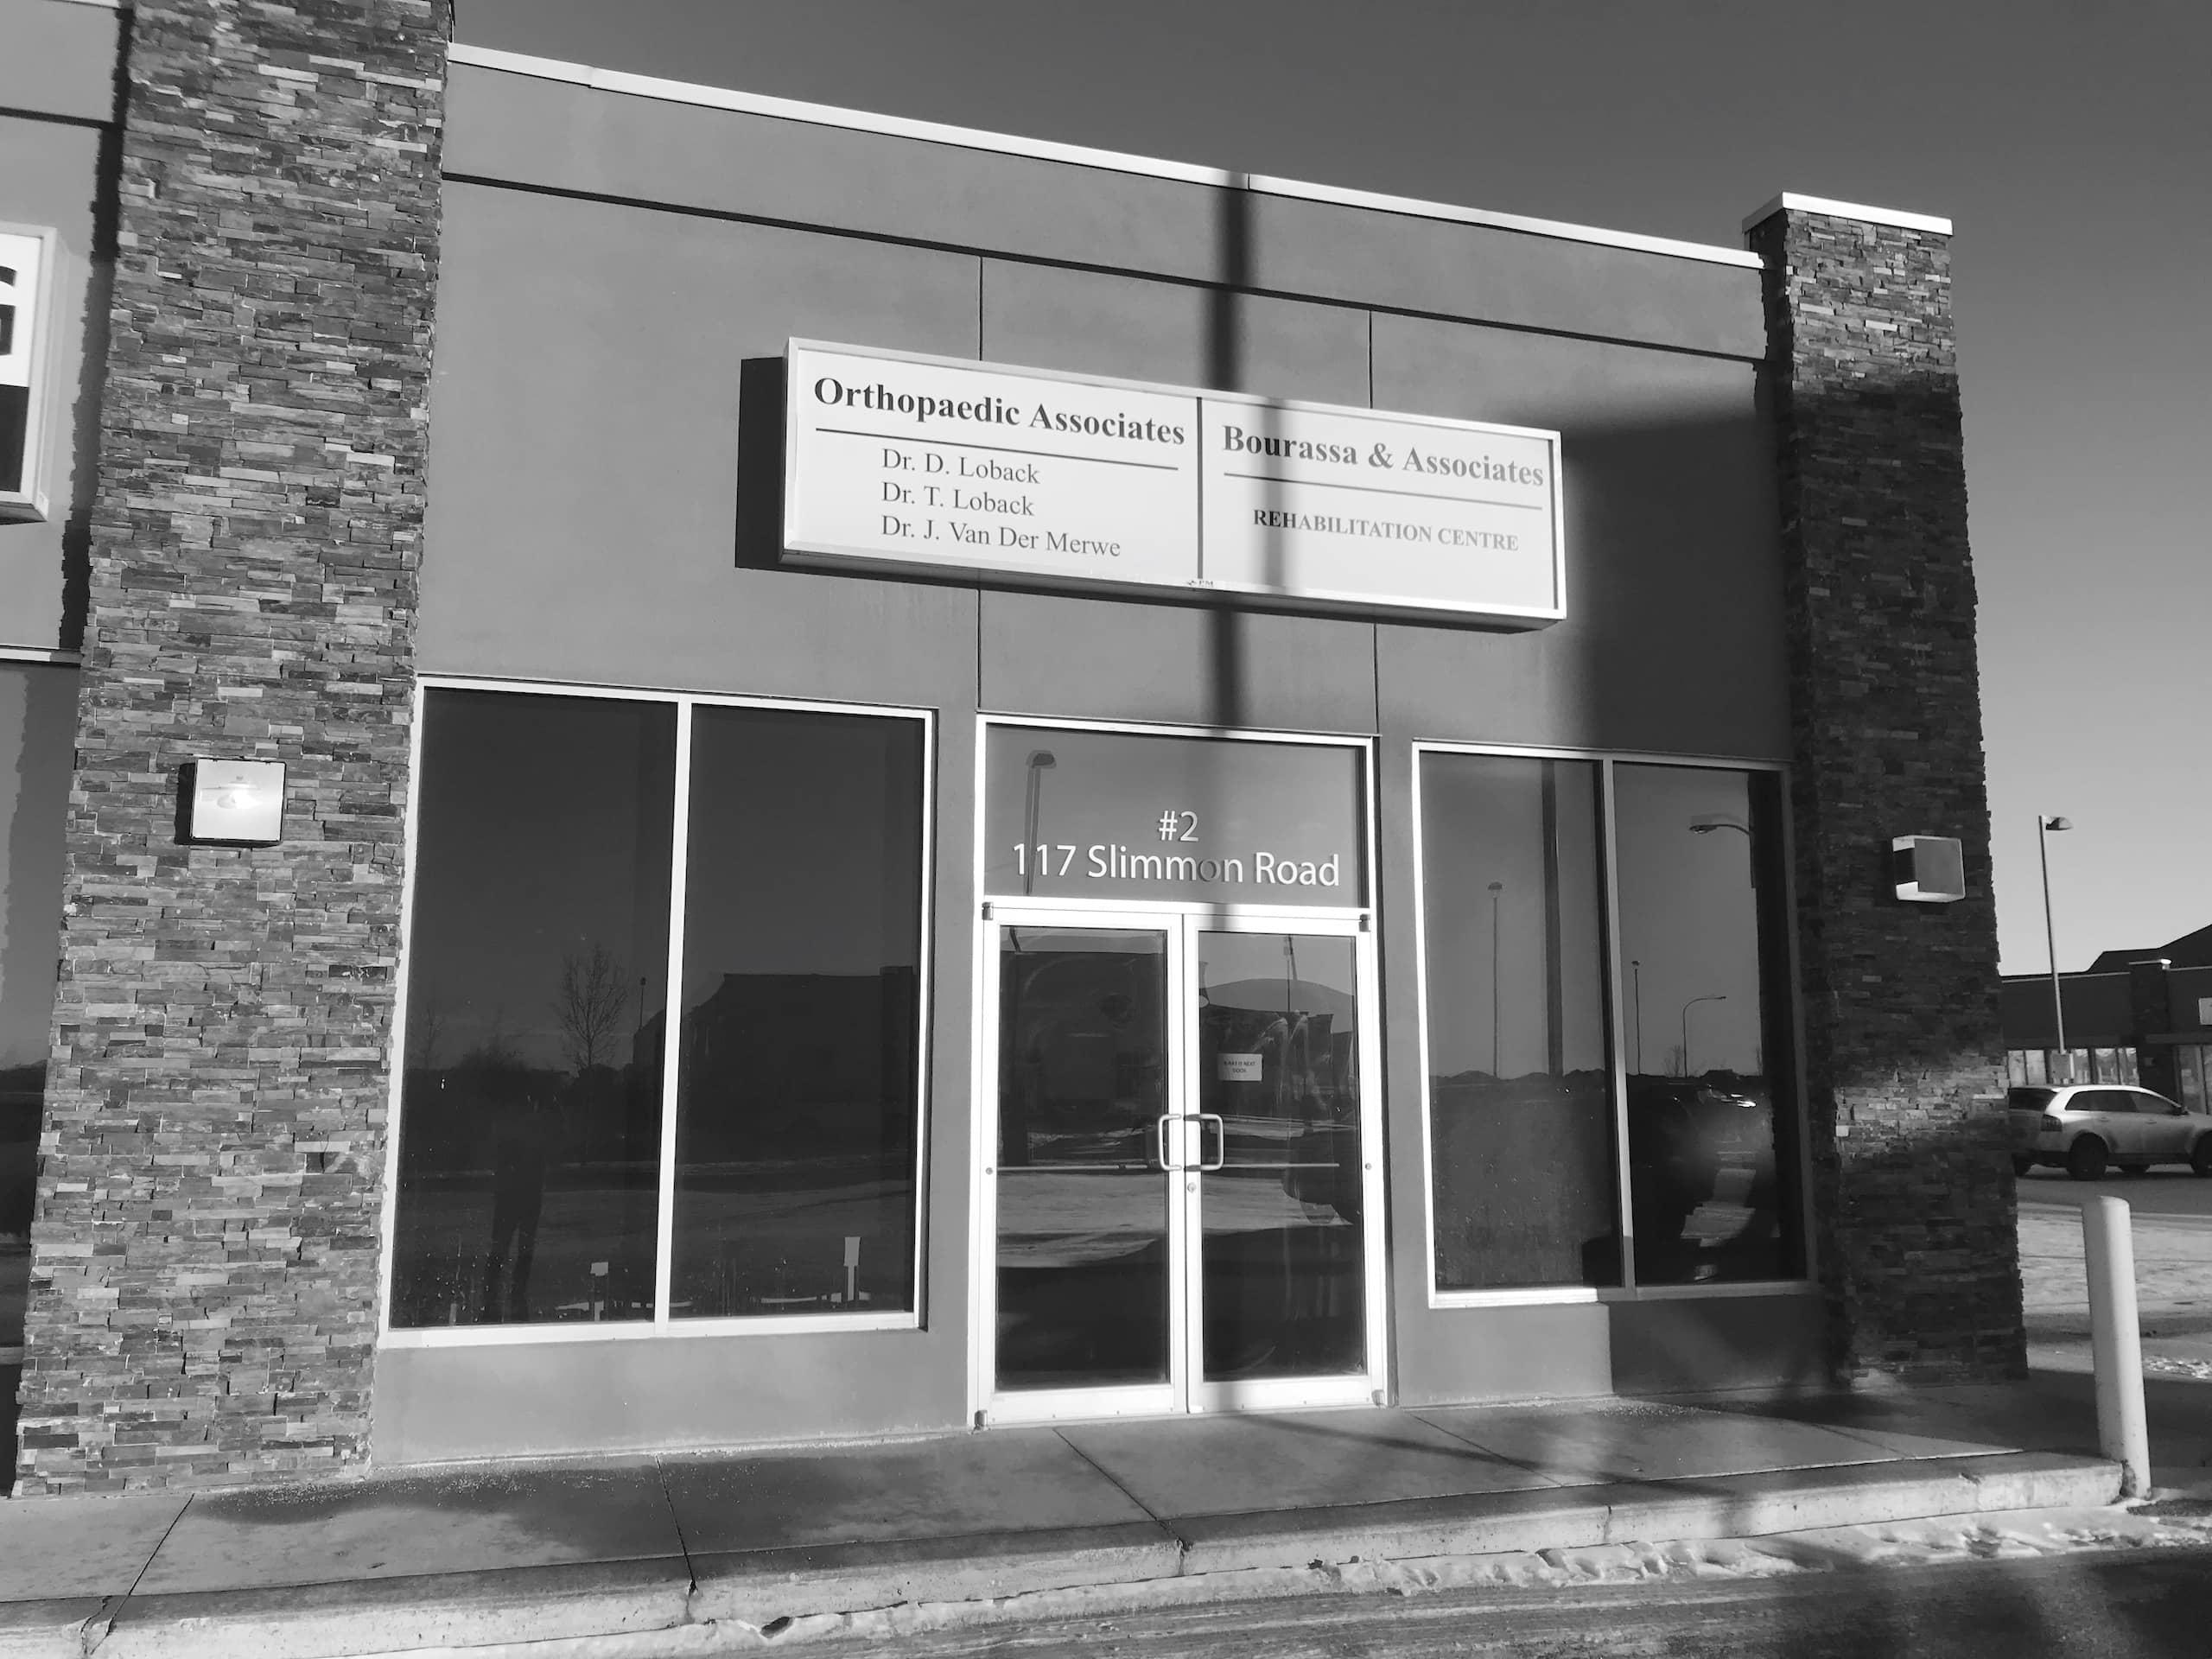 Saskatoon East | Bourassa & Associates Rehabilitation Centre